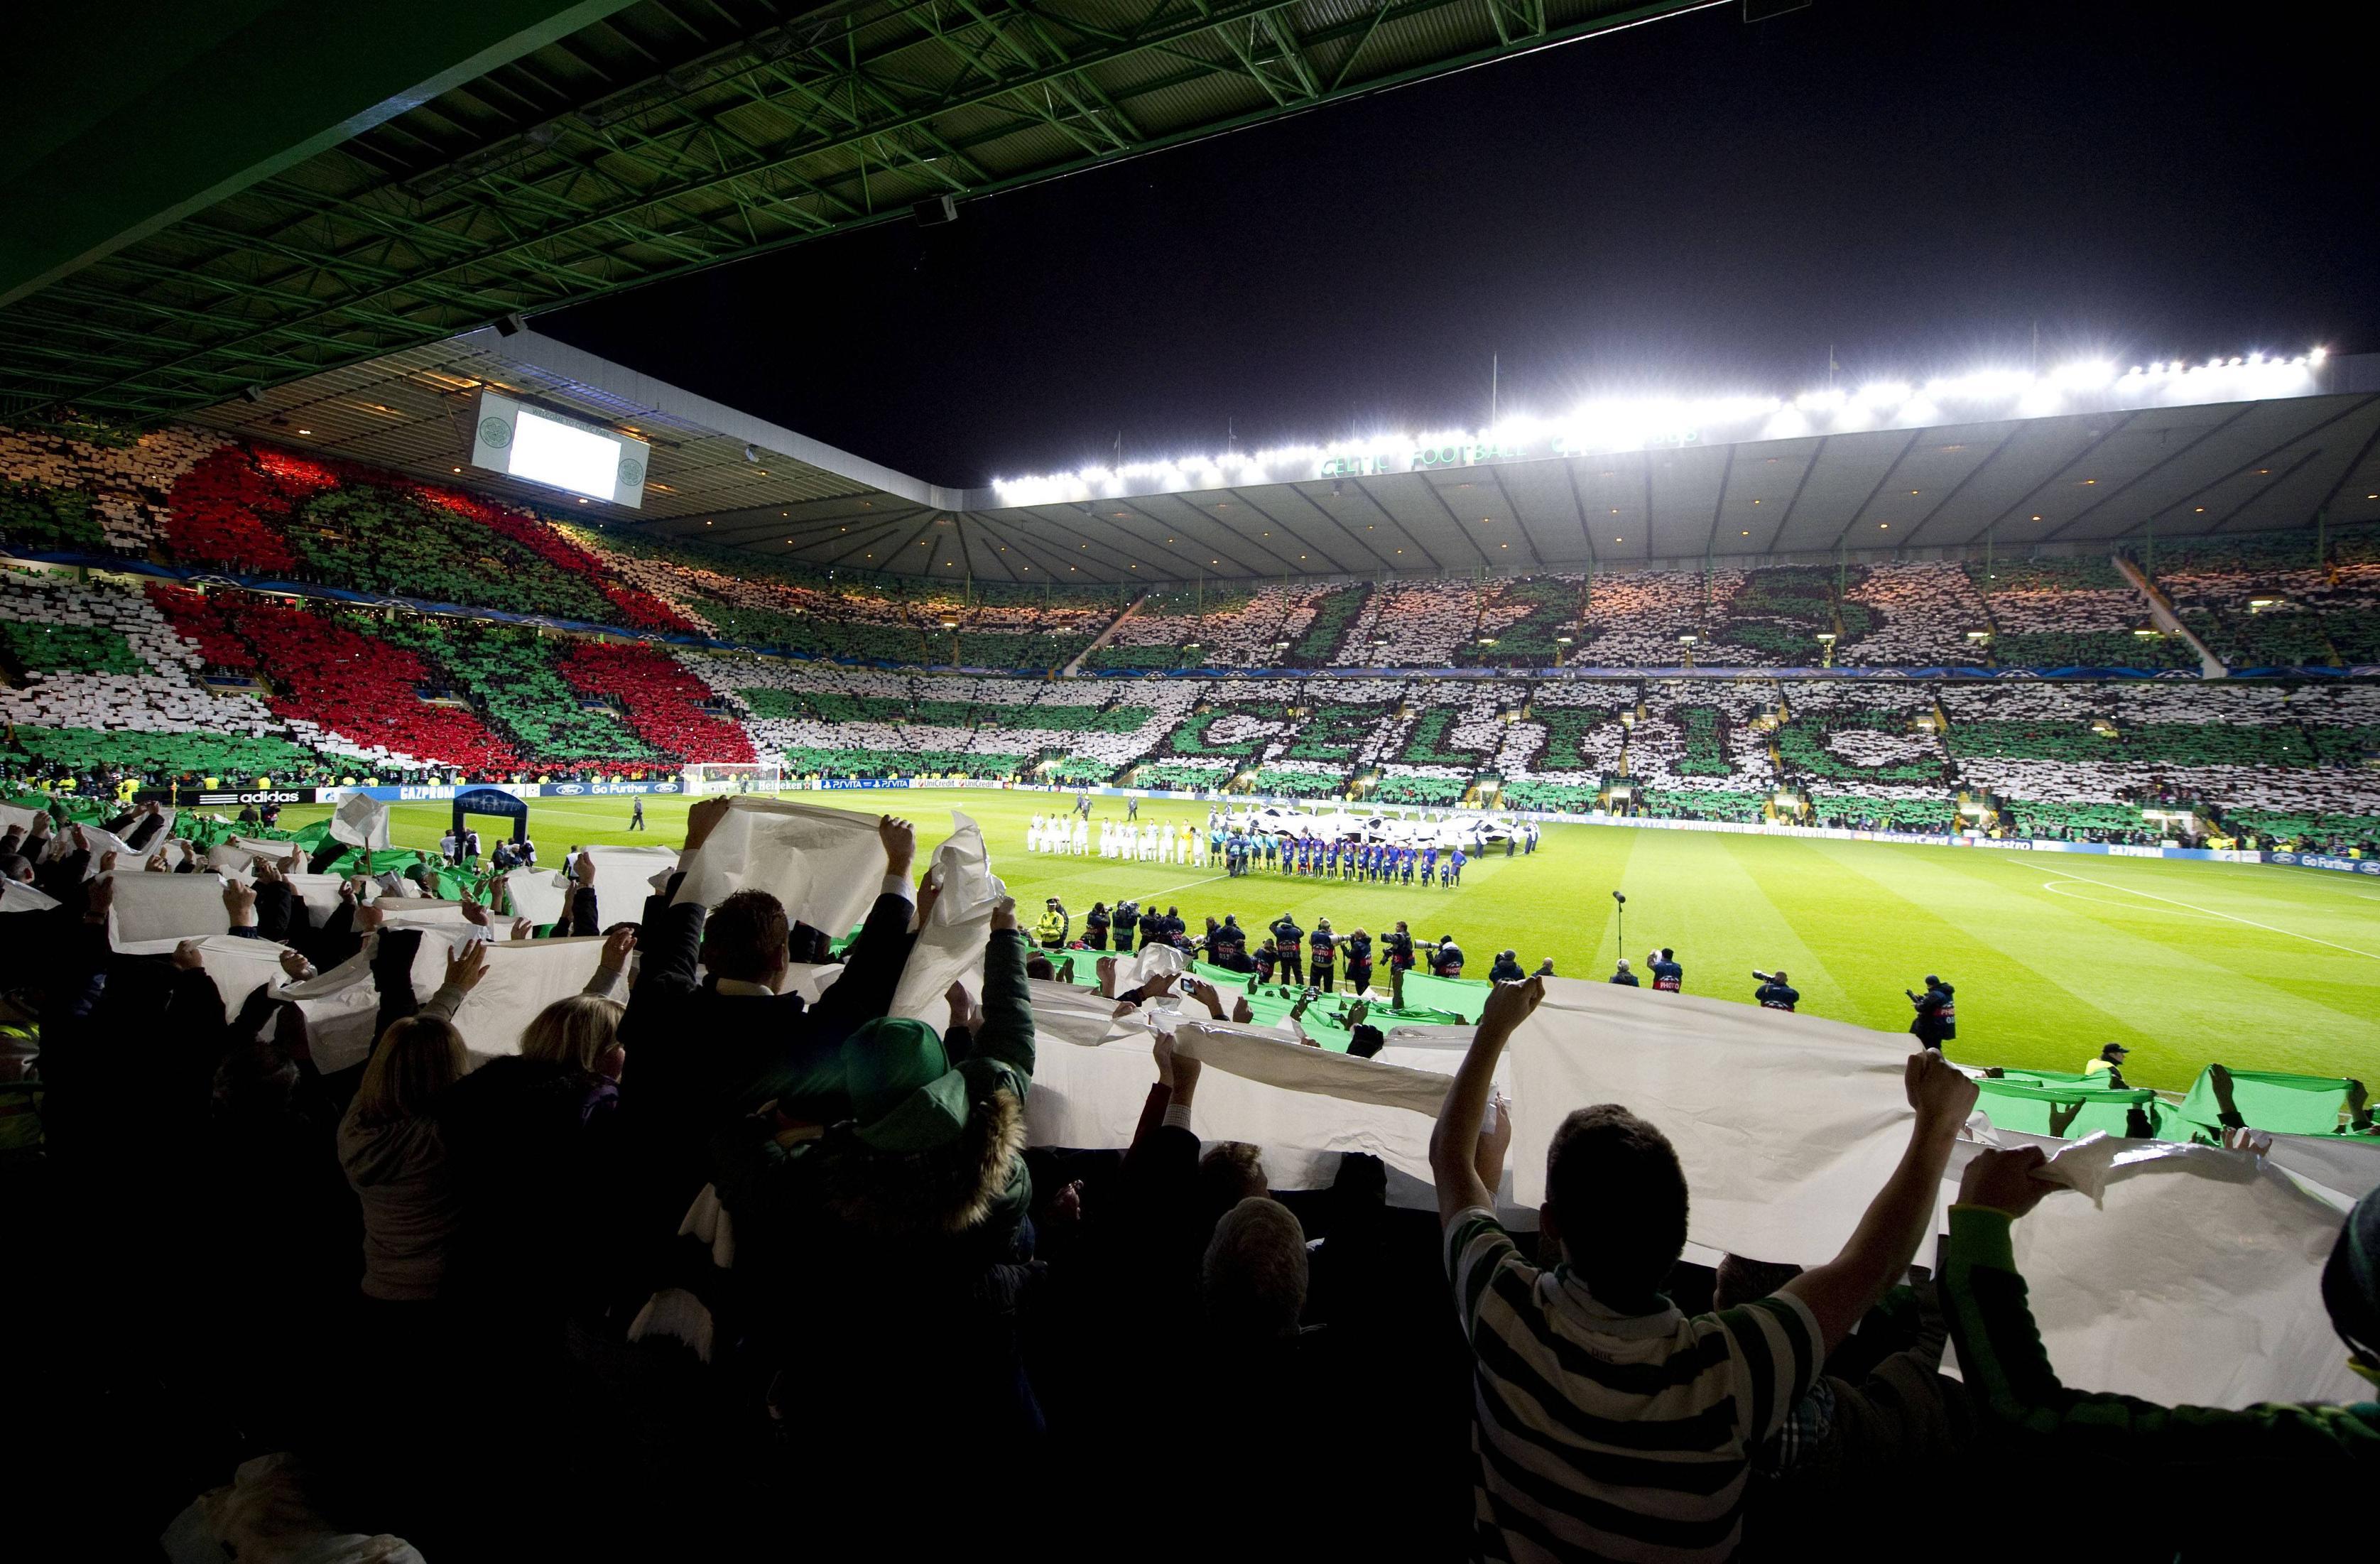 Celtic Fc 2015 Backgrounds 3351x2202